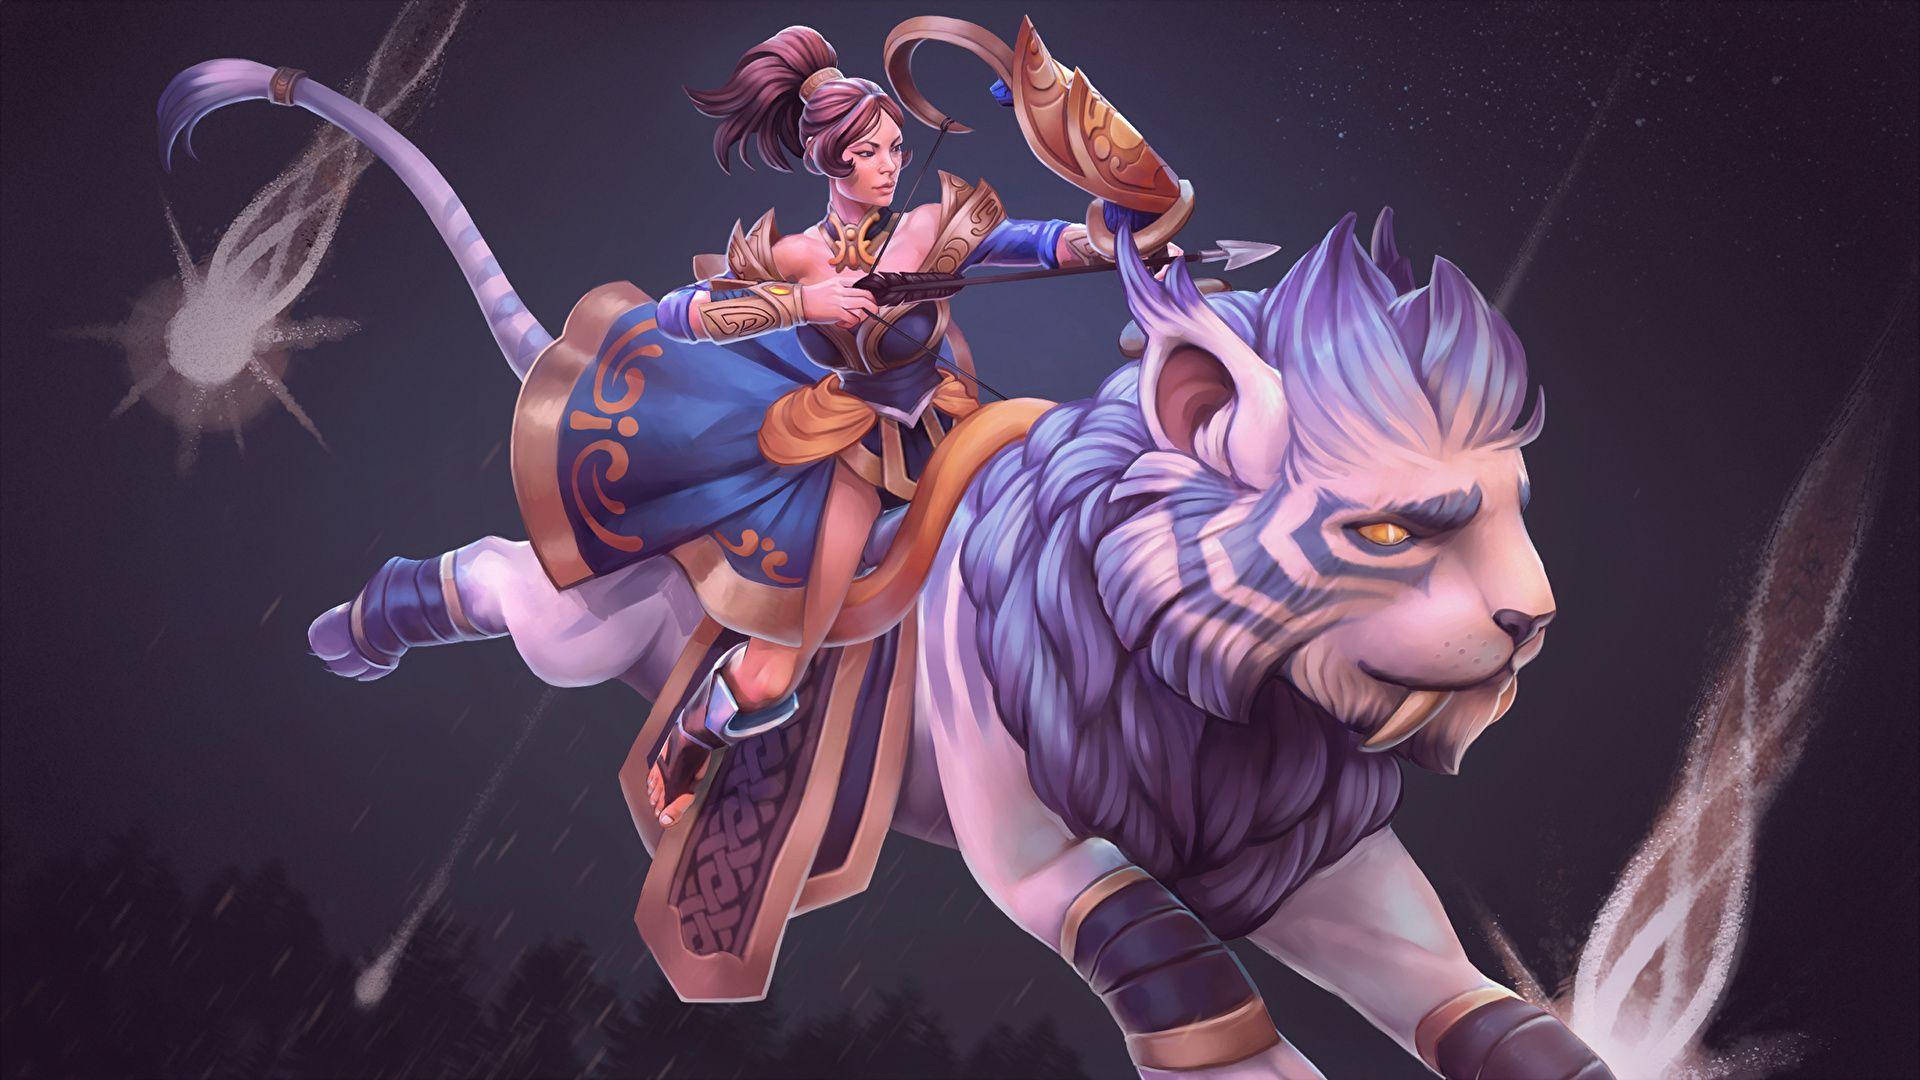 Dota Mirana Warriors Archers Games Fantasy Girls Photofantasy